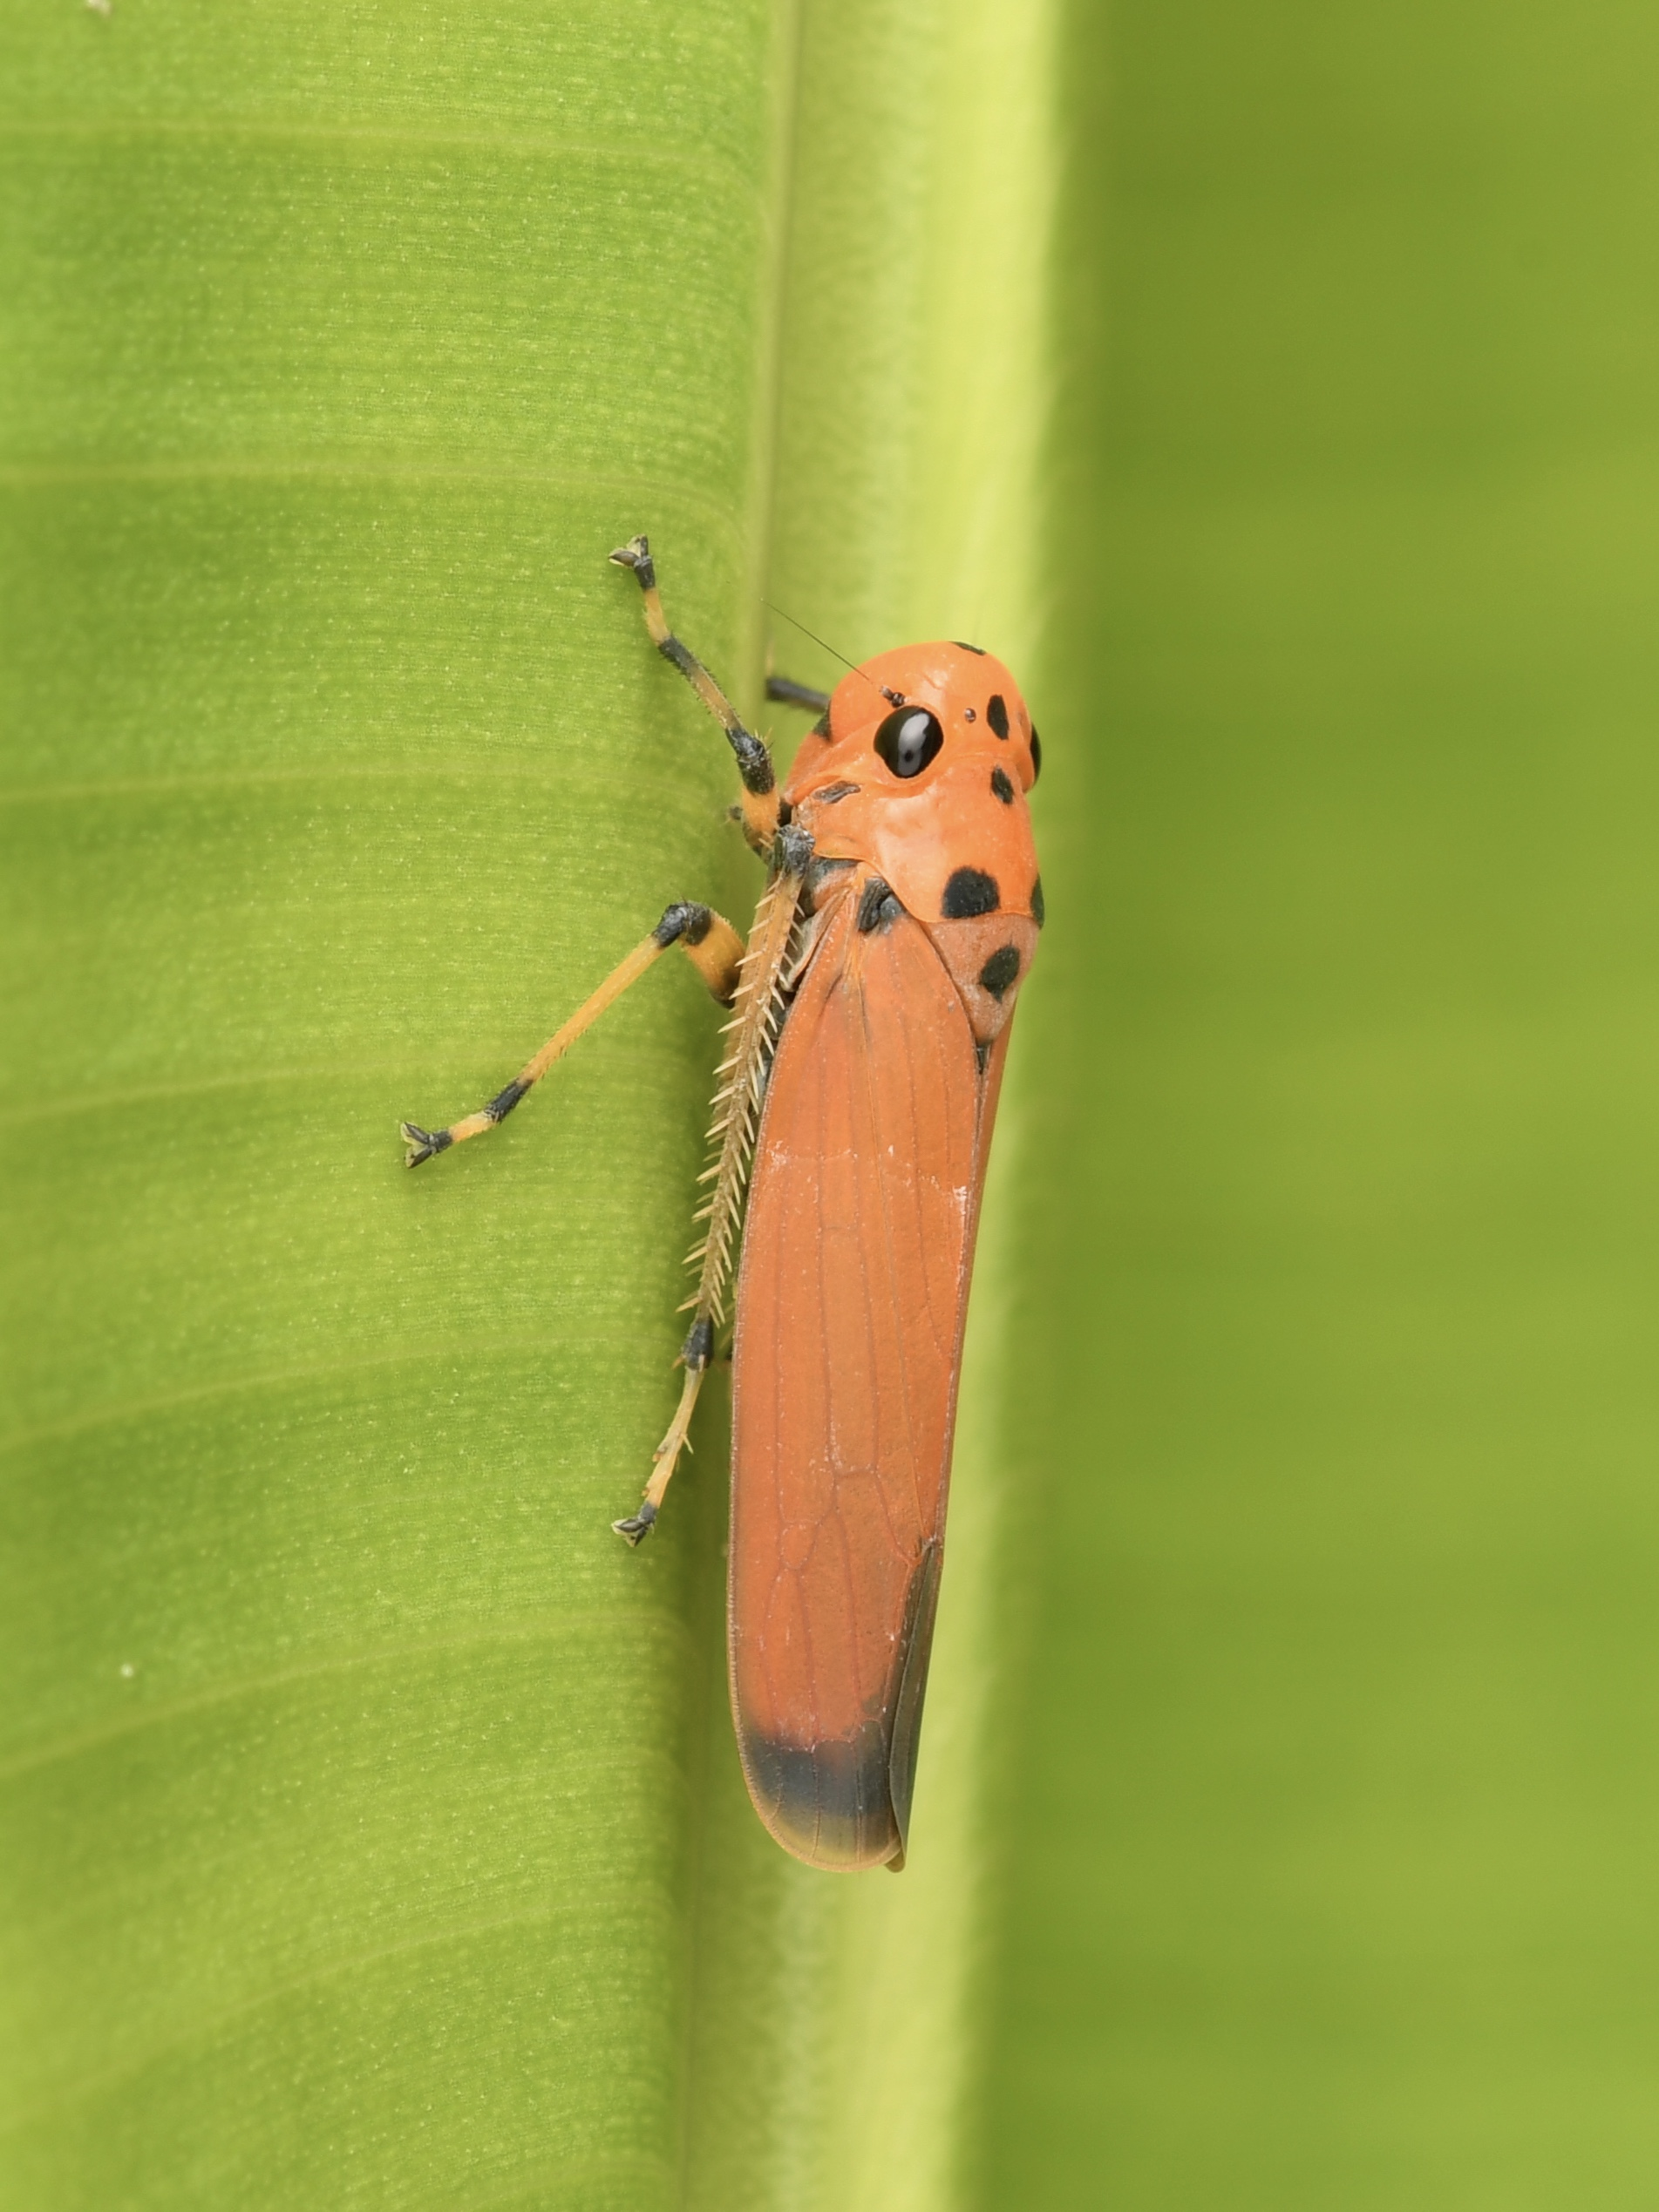 Orange Sharpshooter (Leafhopper) ( Bothrogonia addita ),   Penang Island, Malaysia  • Nikon D500, Tokina 100mm f/2,8 macro, Nikon SB900 @ 1/4 power with Alex Goh Macro Diffuser, ISO100, f/18, 1/200s